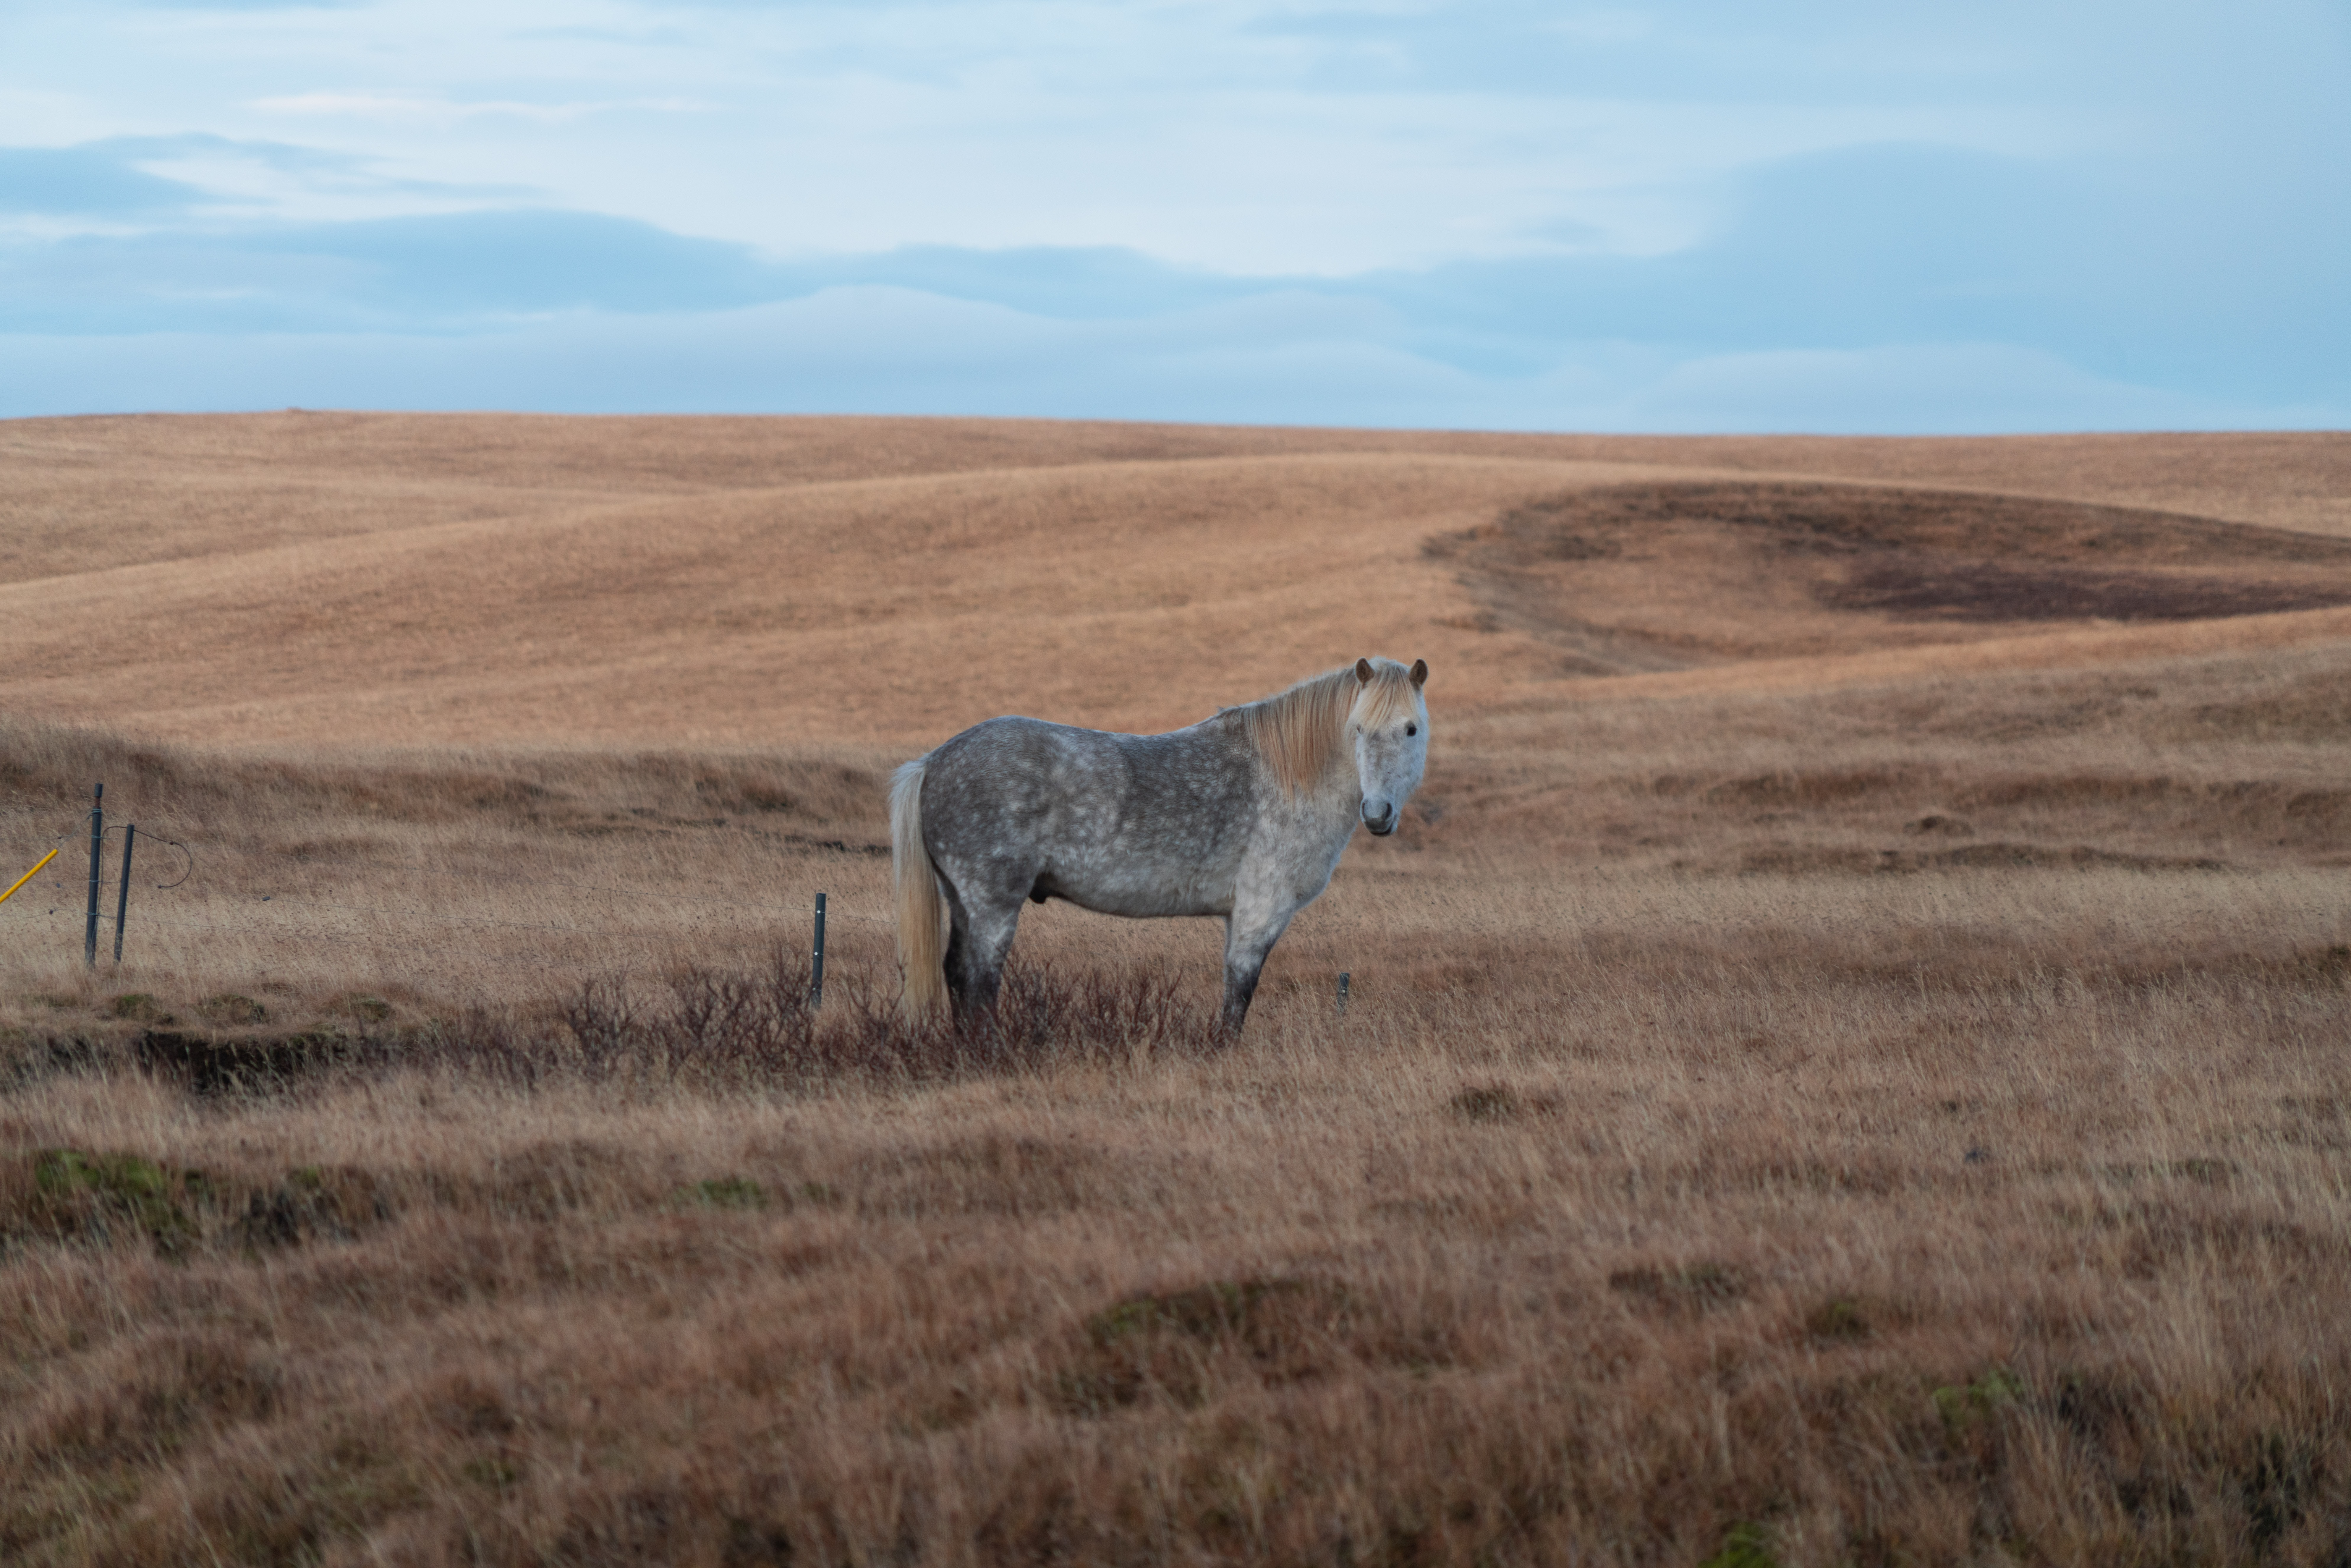 horse standing on brown grass field